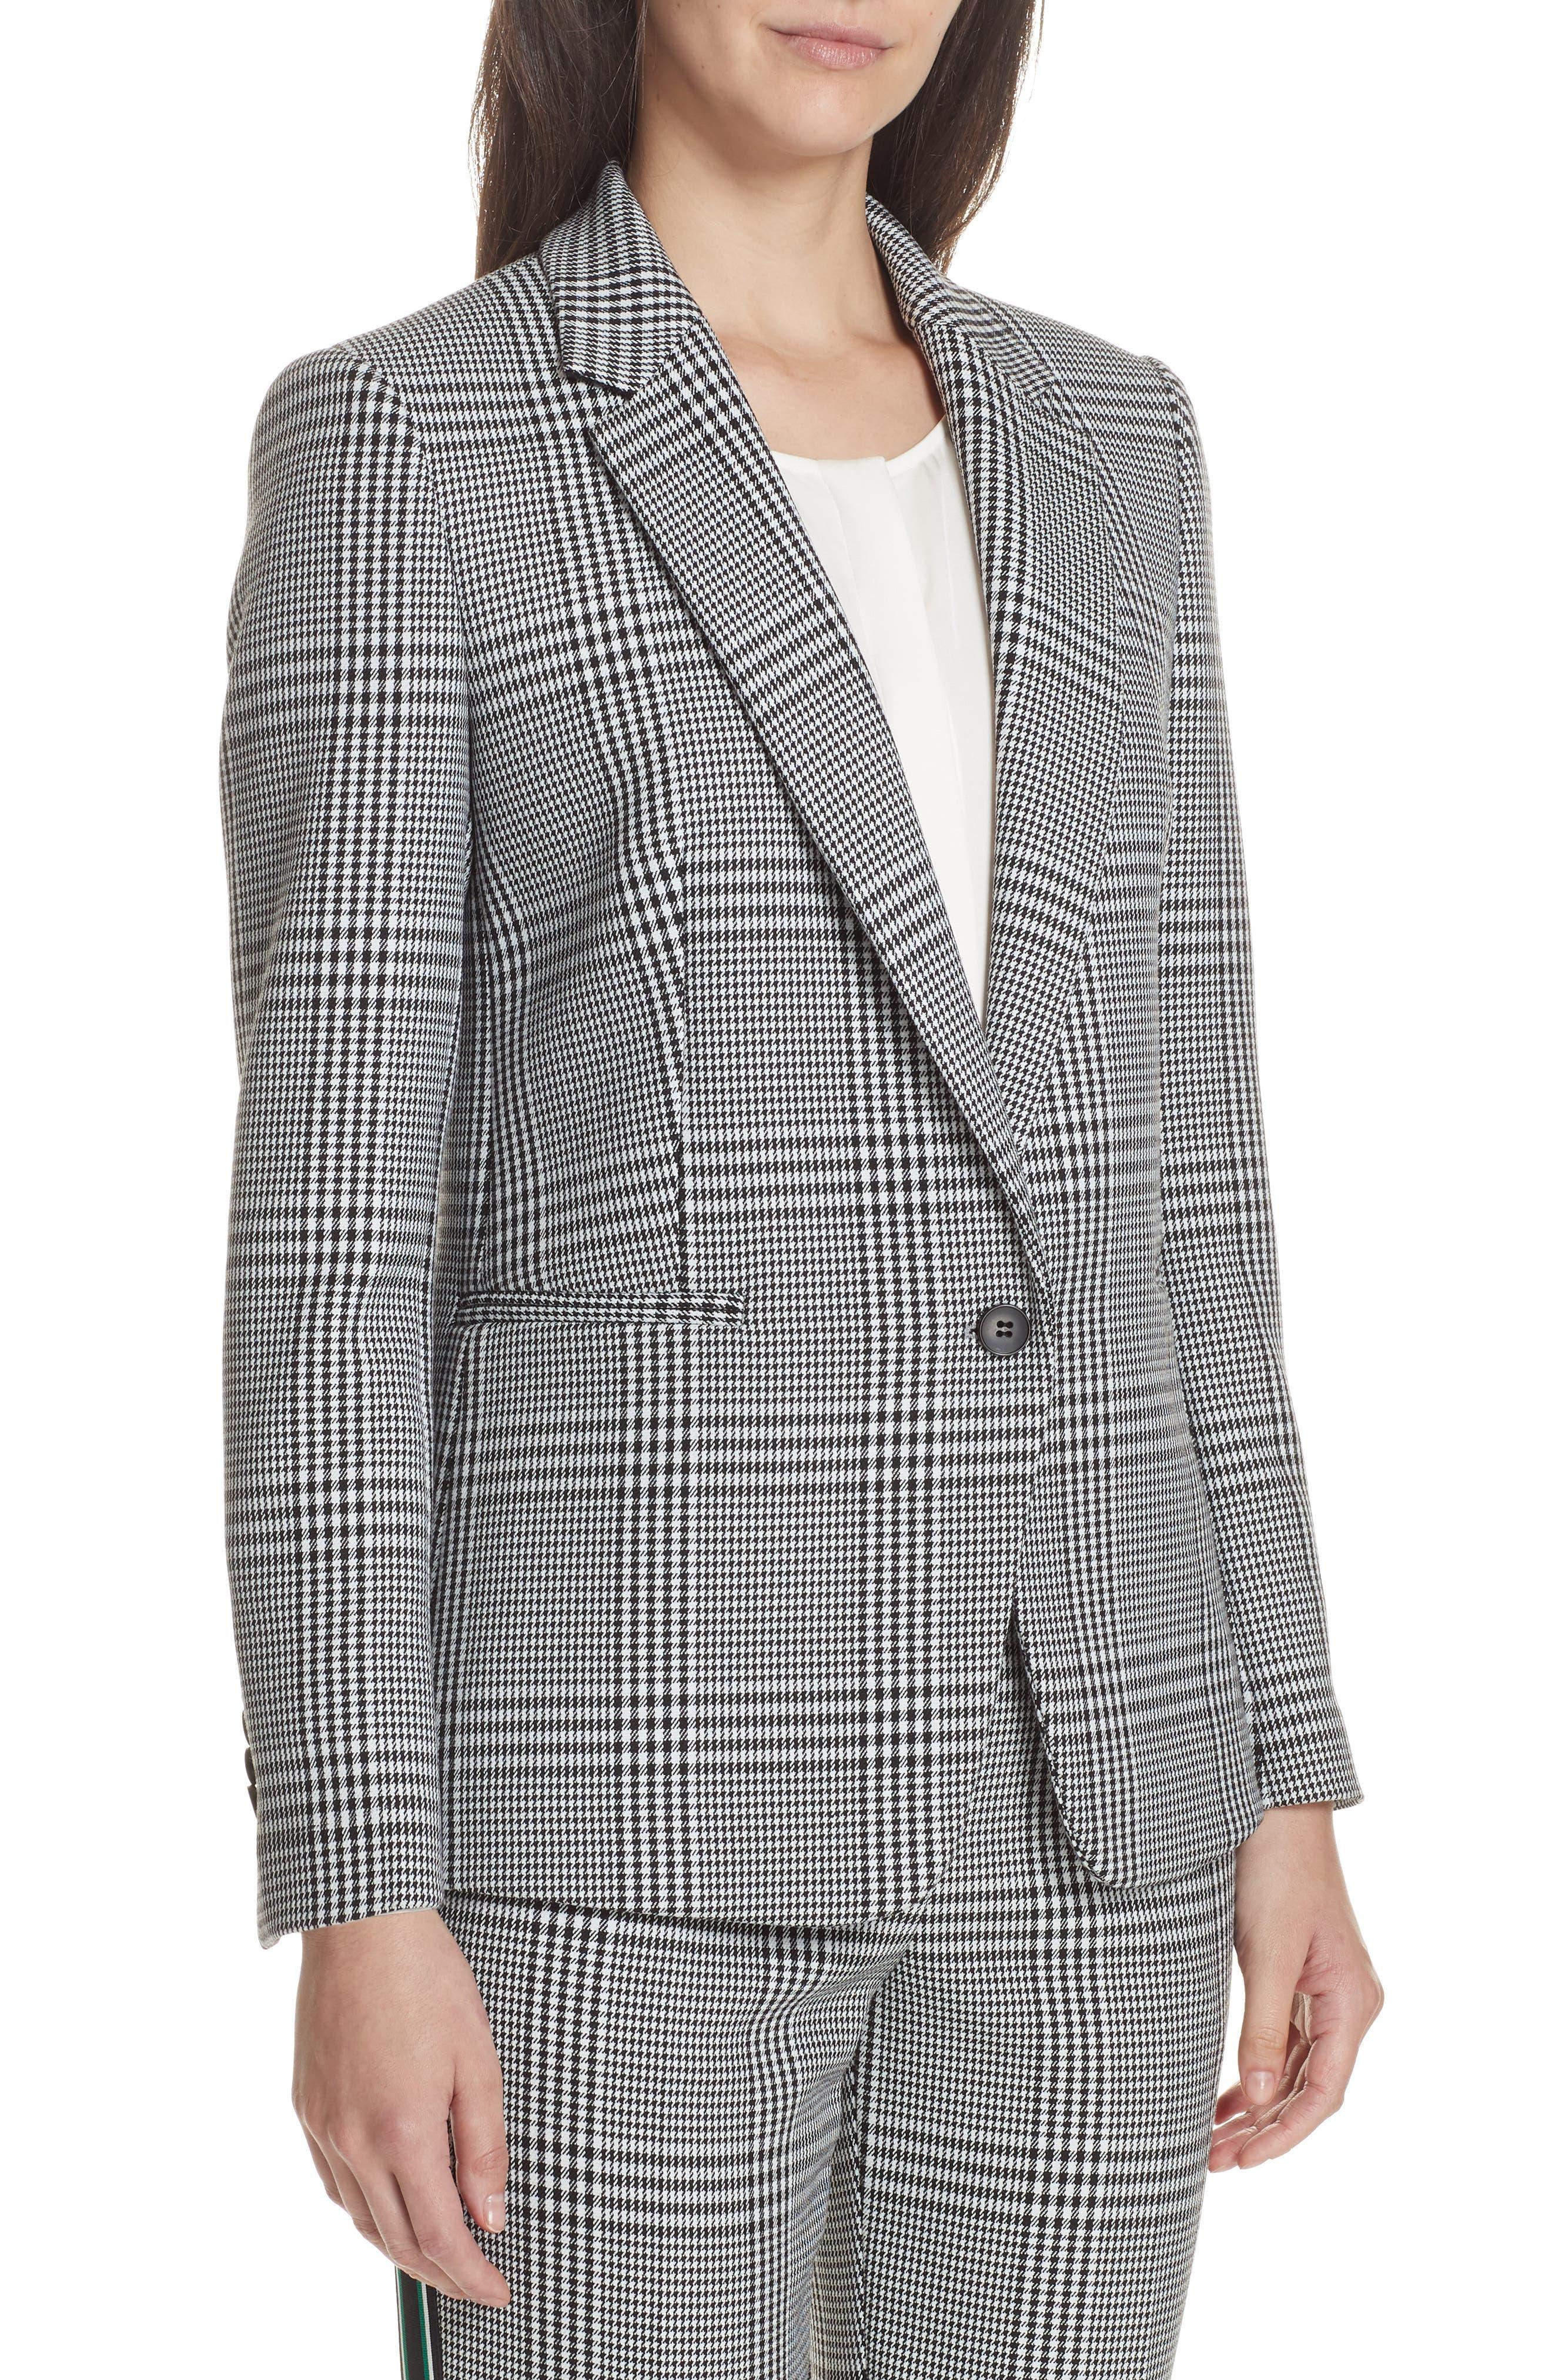 Jemaromina Glen Plaid Suit Jacket,                             Alternate thumbnail 4, color,                             GLENCHECK FANTASY